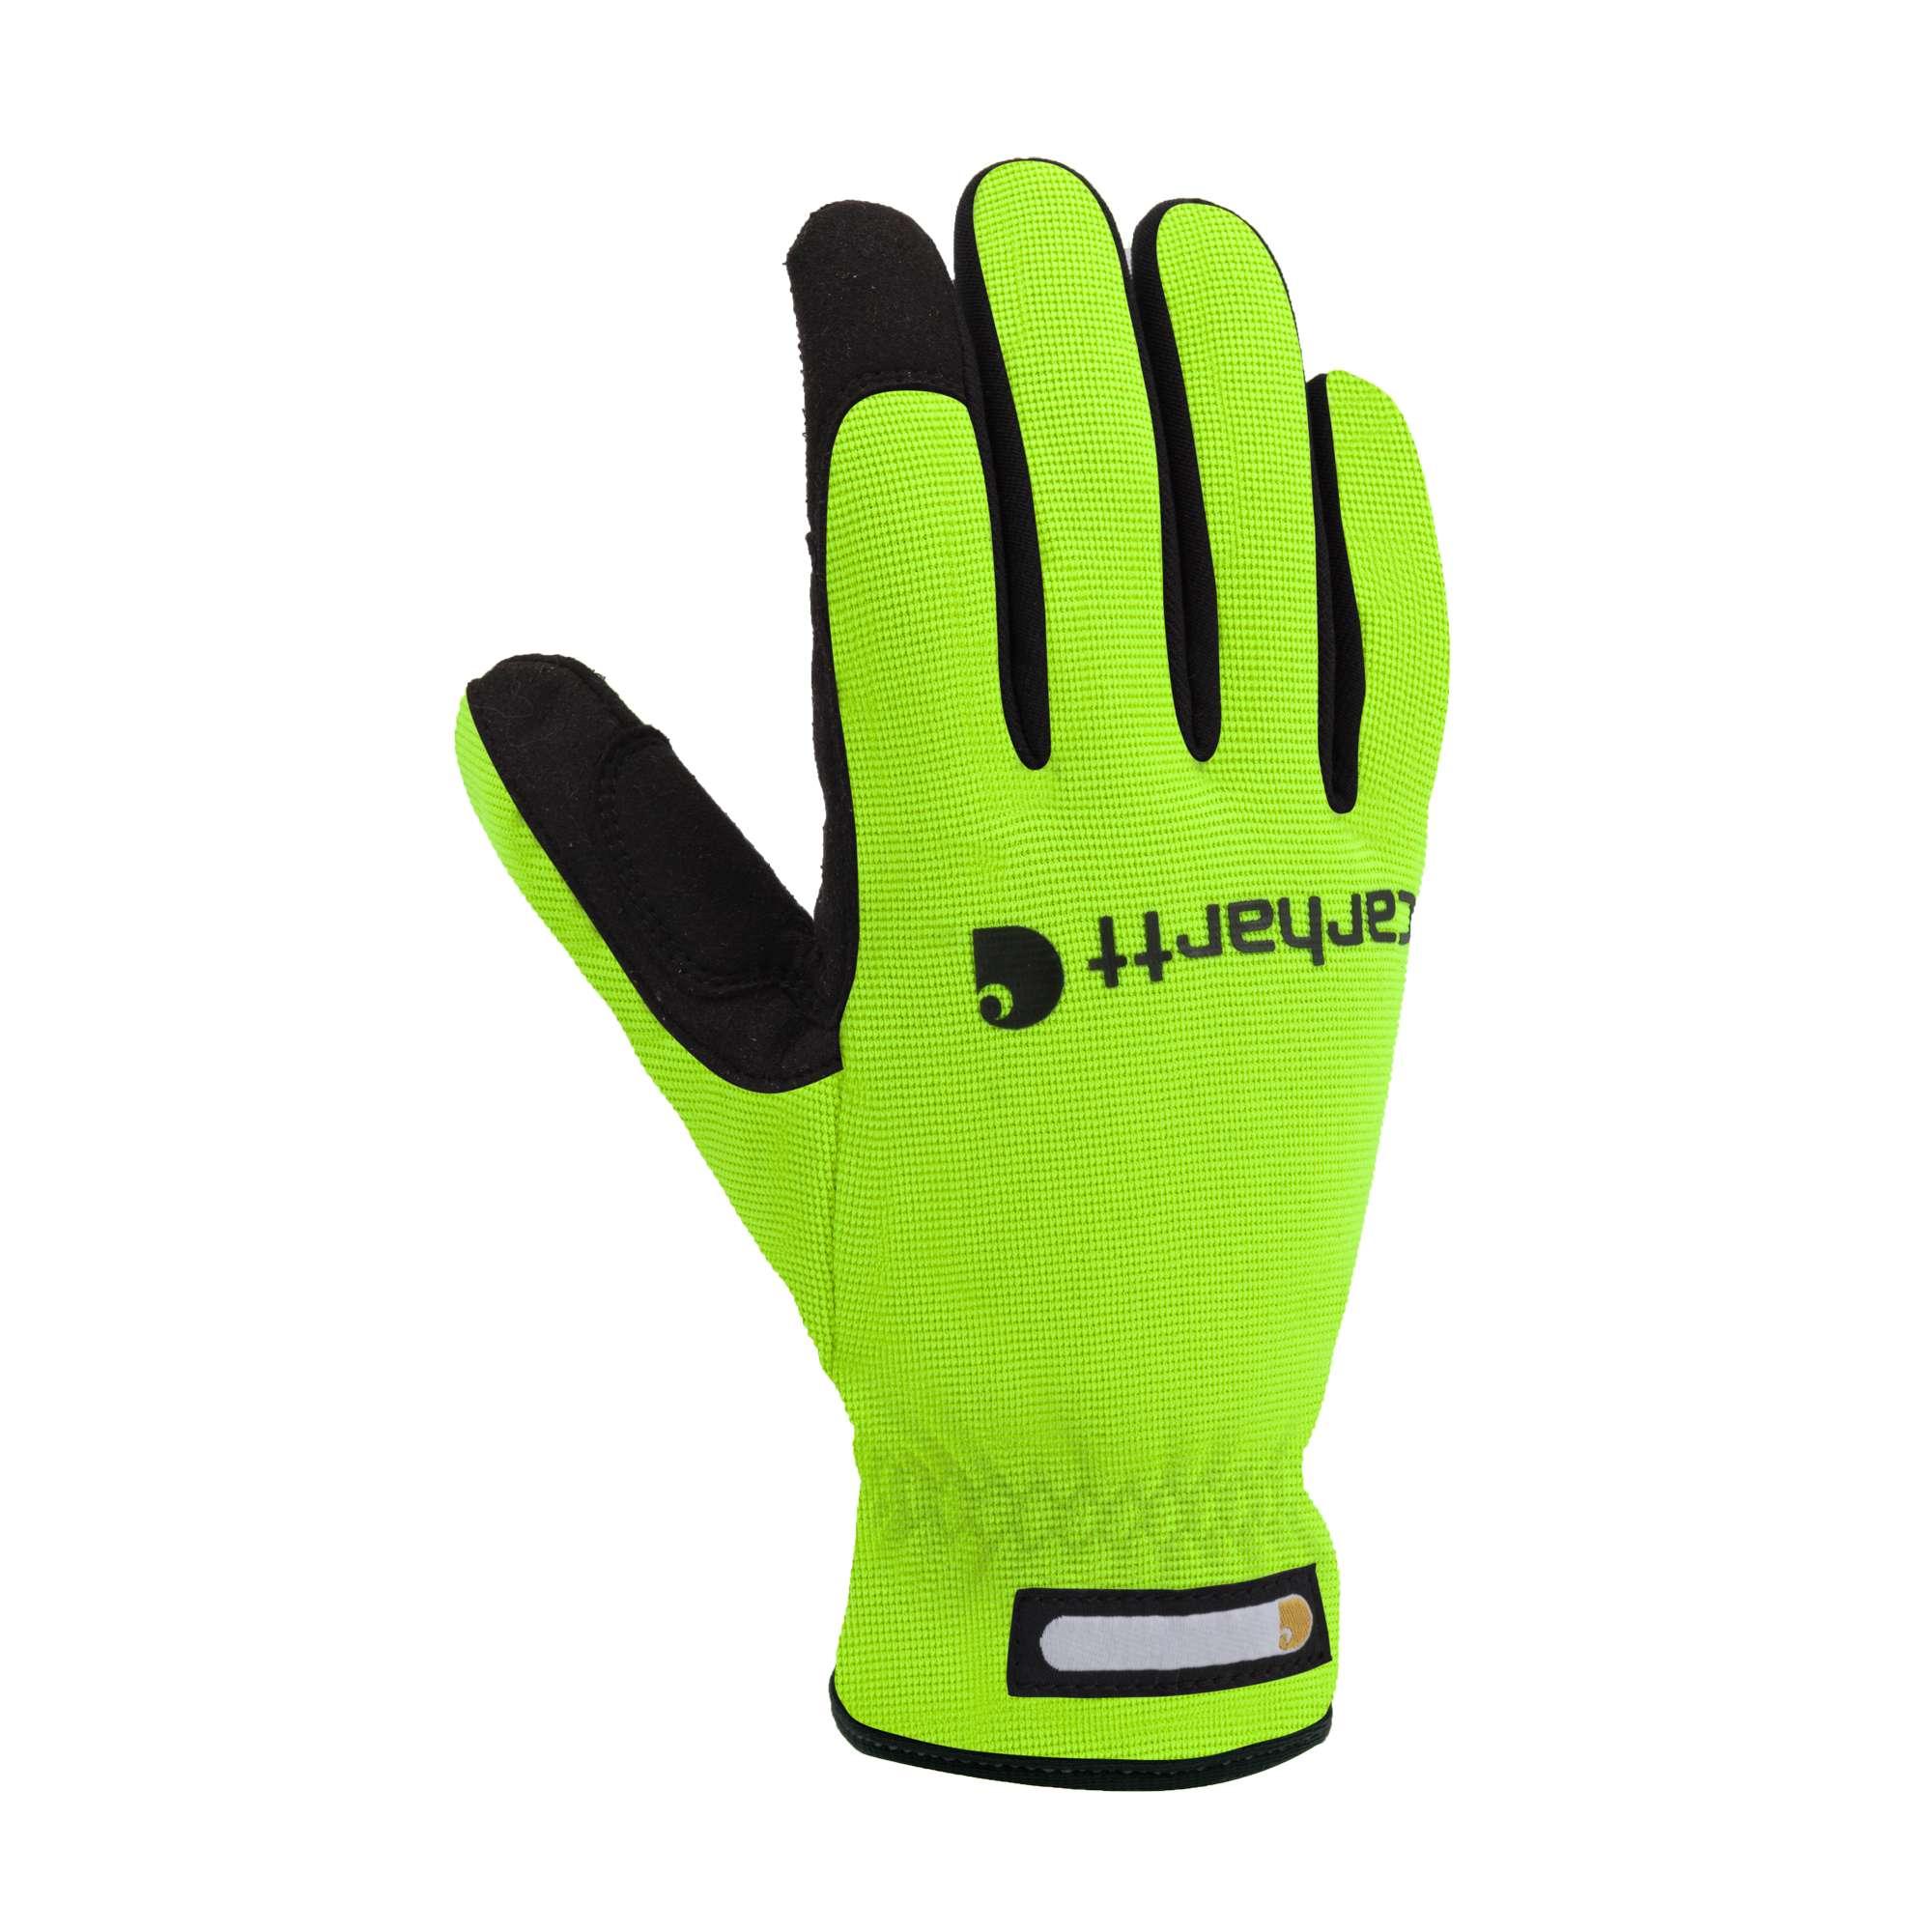 Carhartt Work-flex Glove